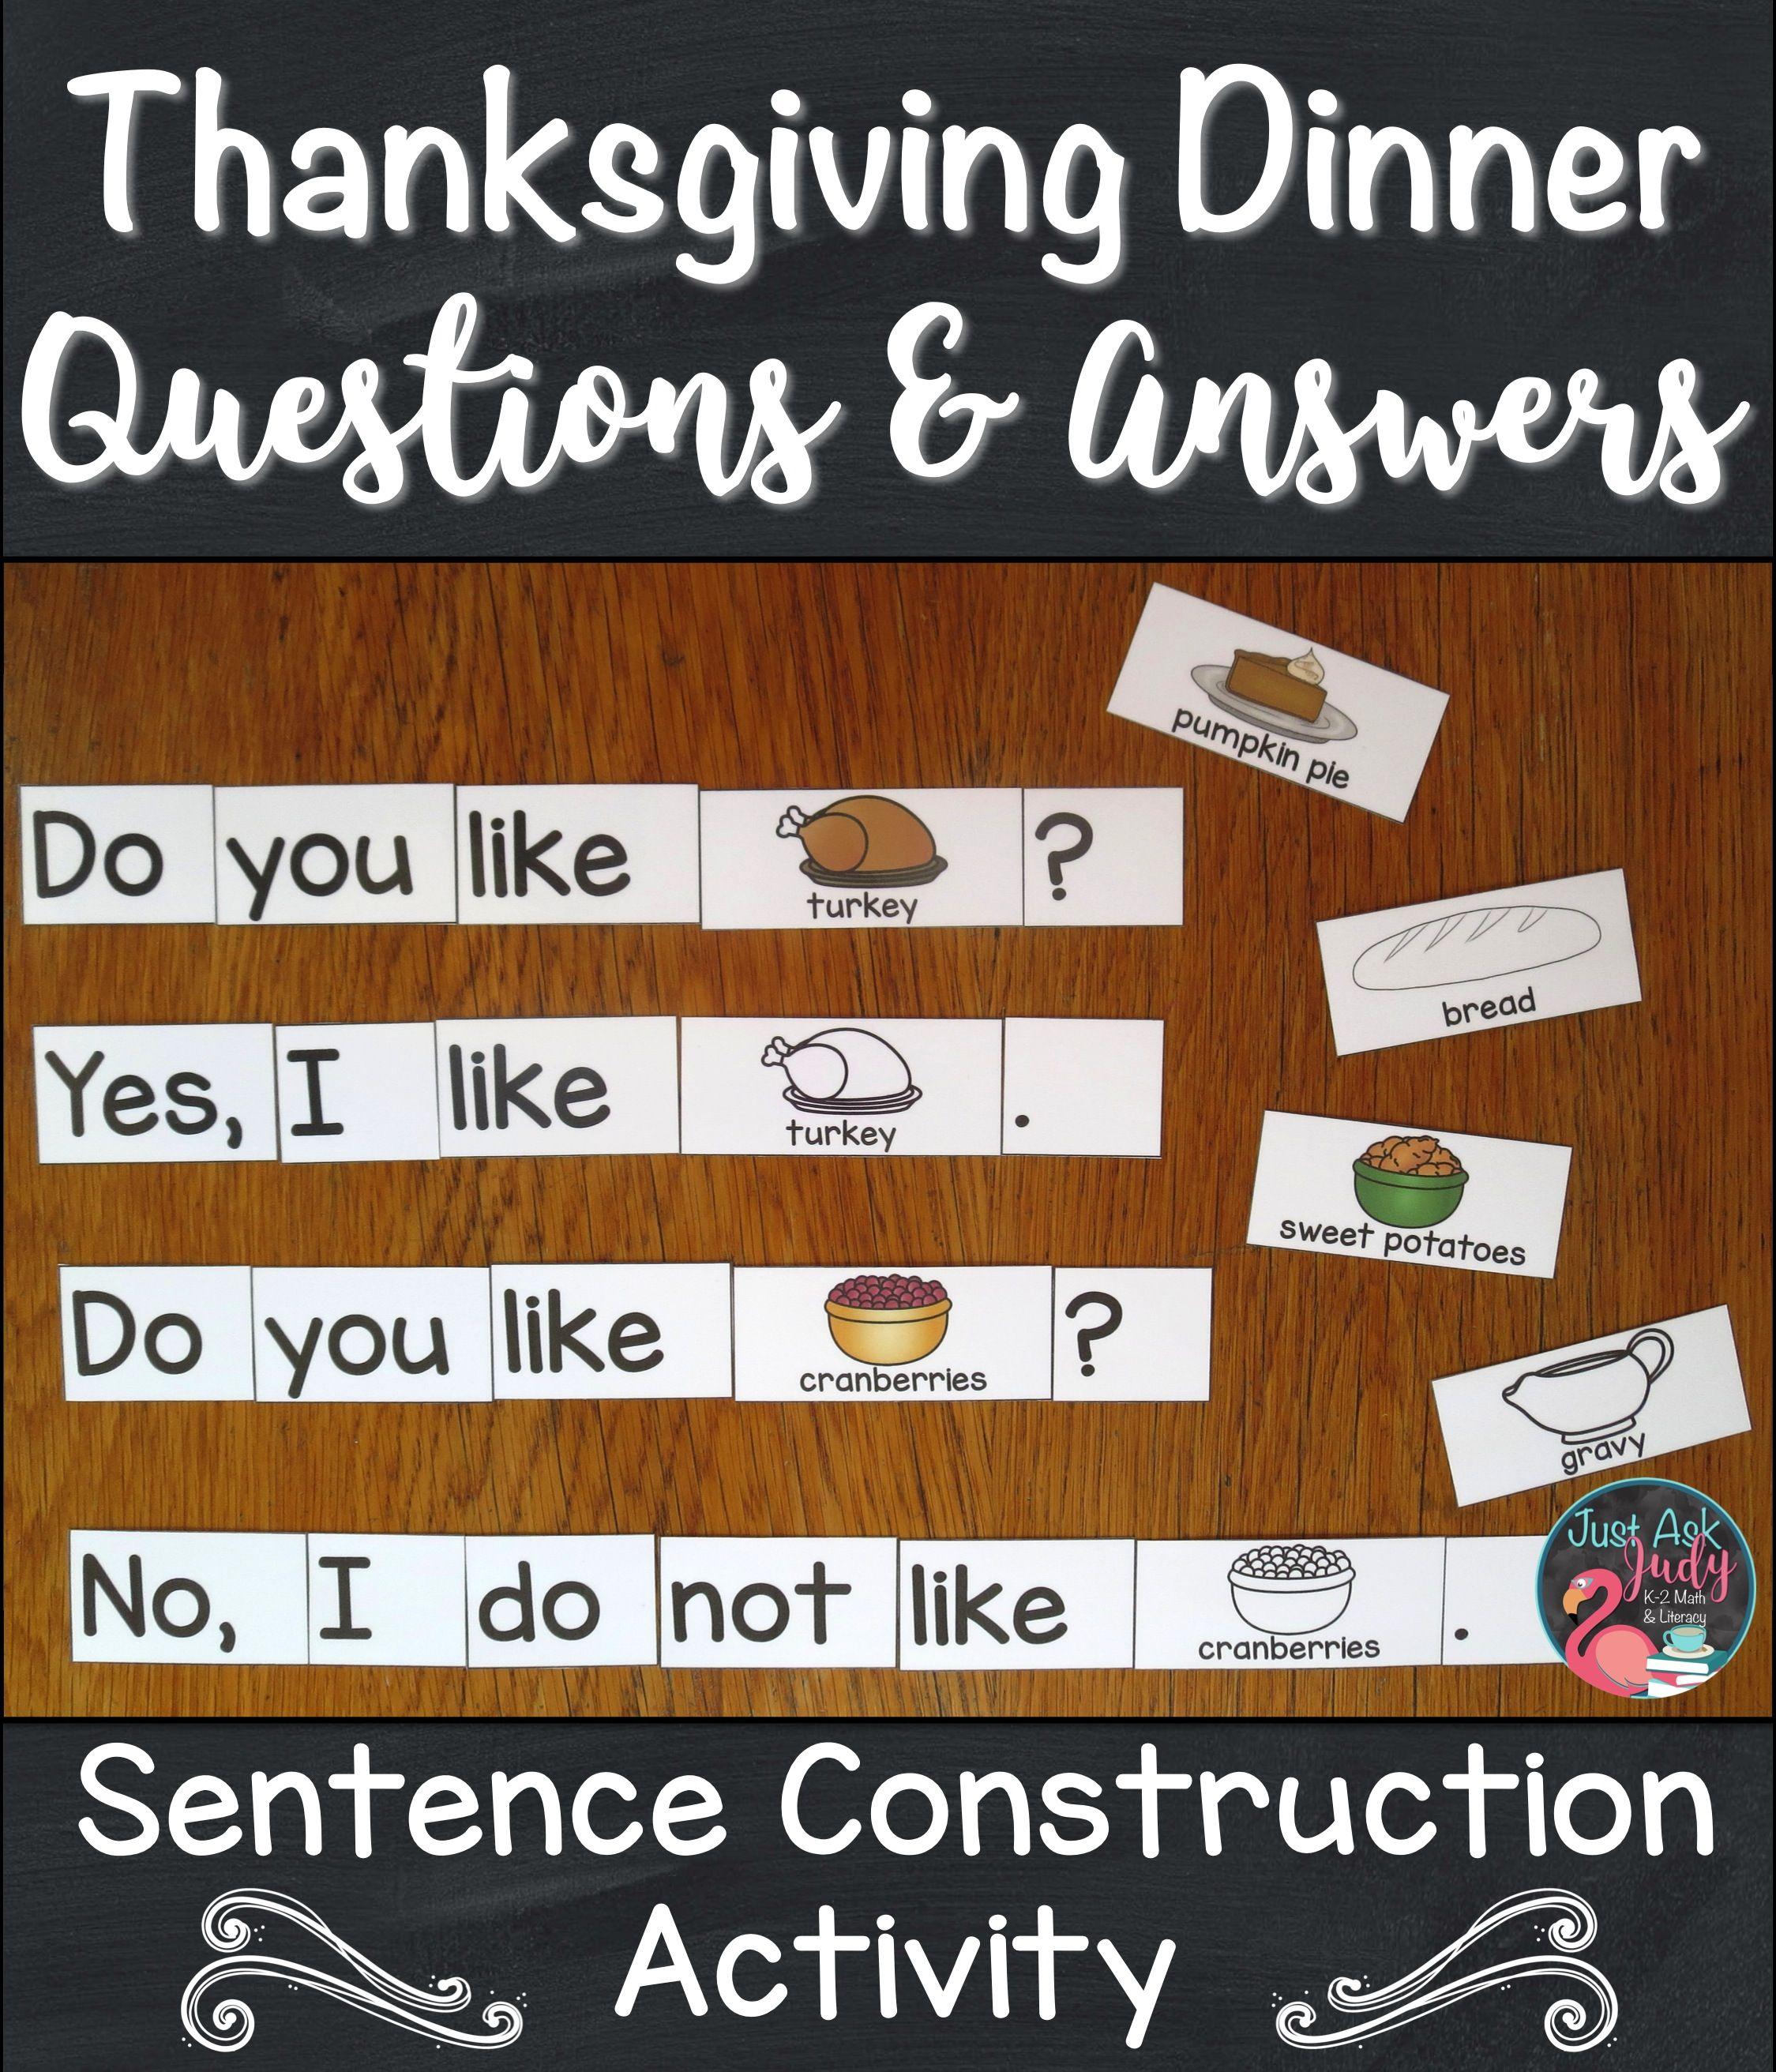 Sentence Construction Activity Thanksgiving Dinner